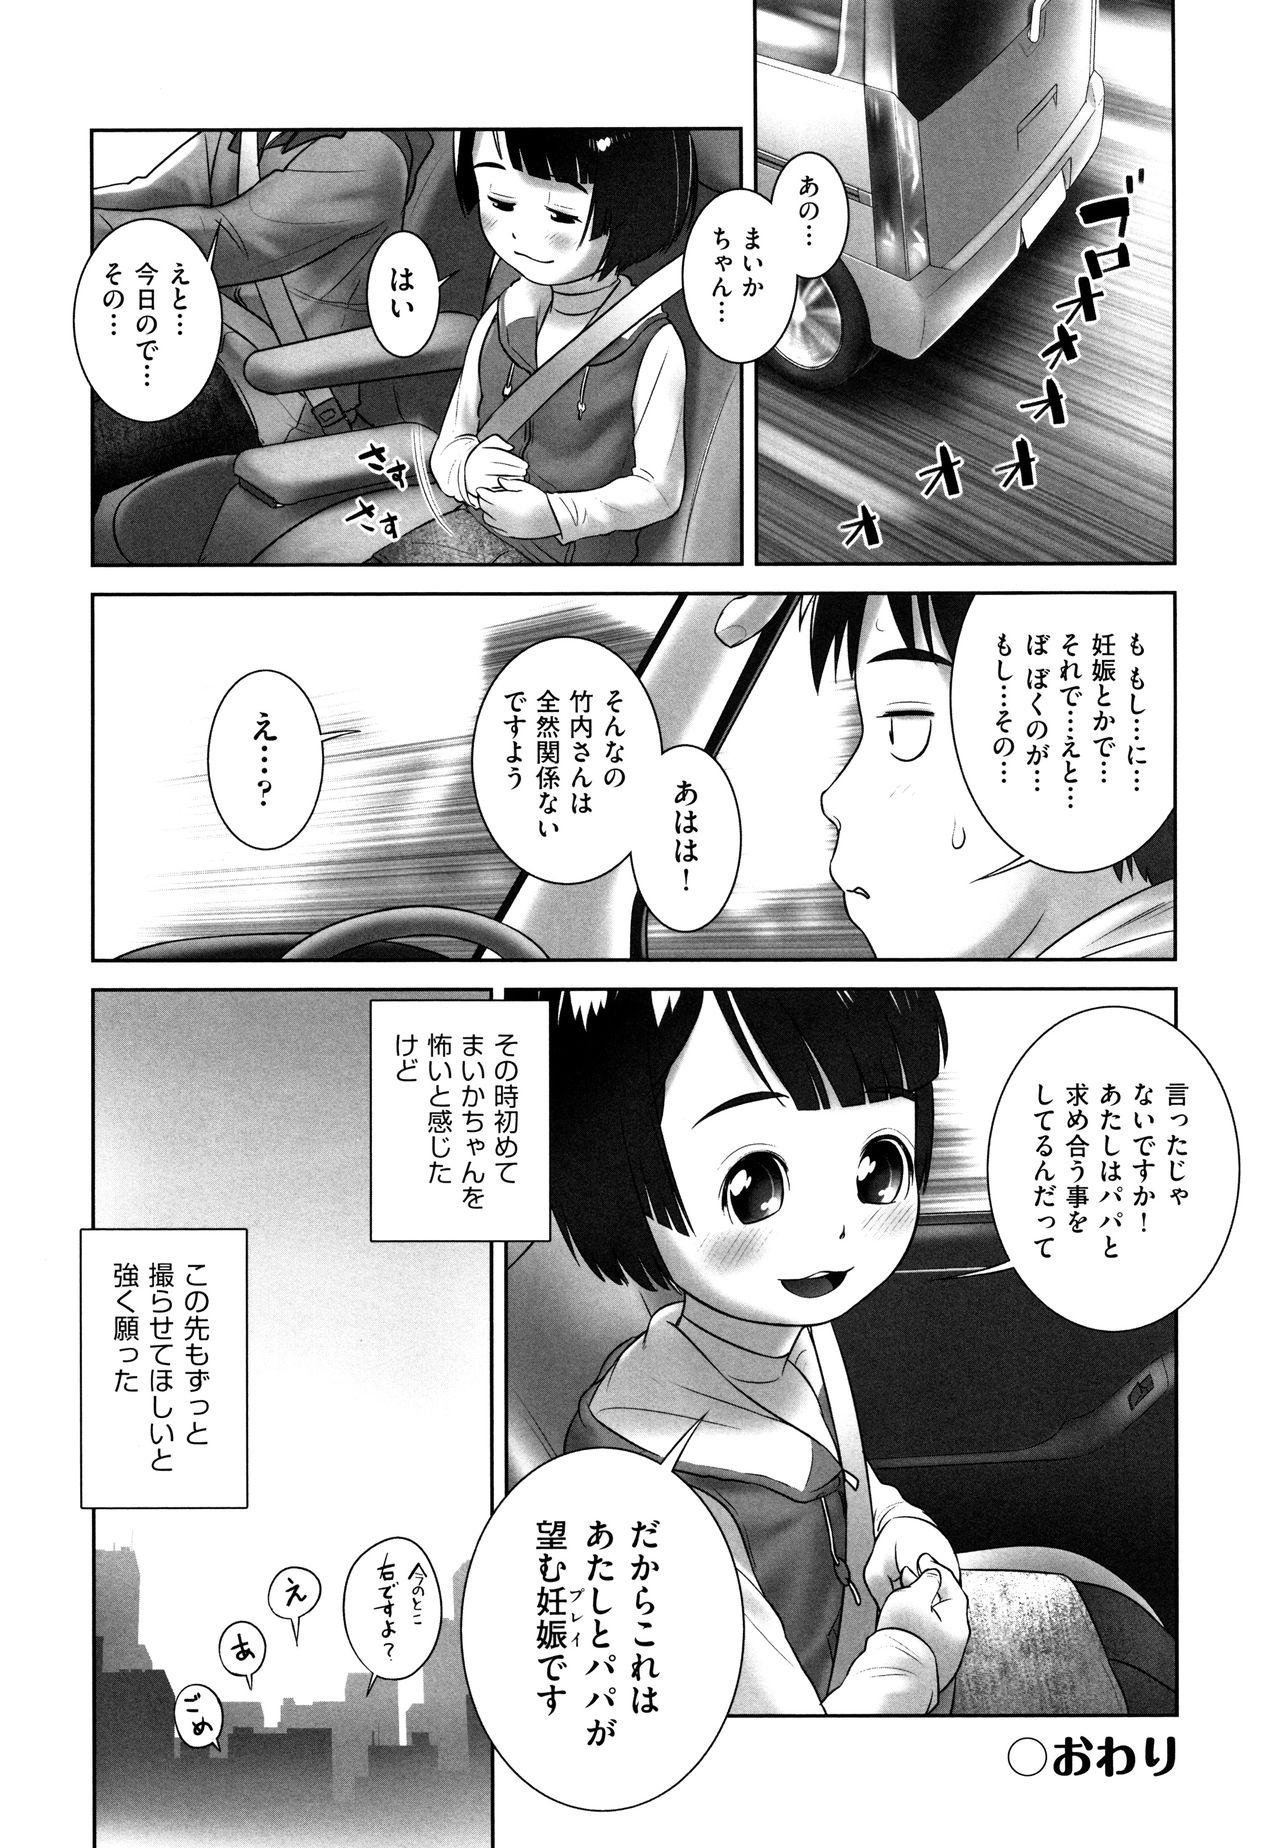 Shoujo Kumikyoku 7 138